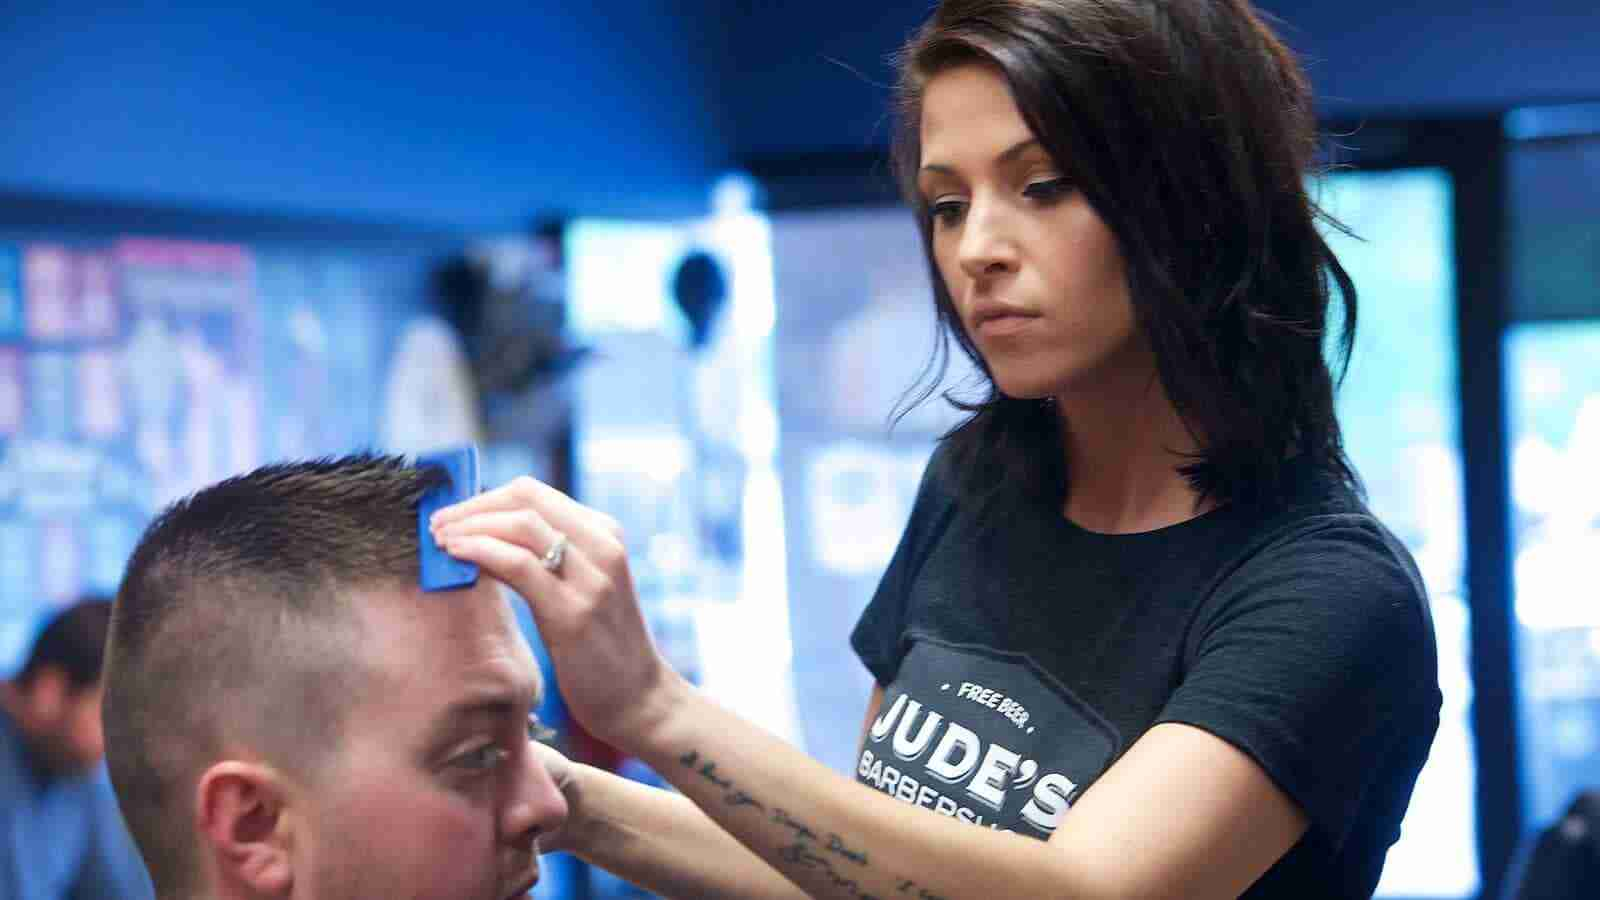 Jude's Barbershop - Haircuts for Men